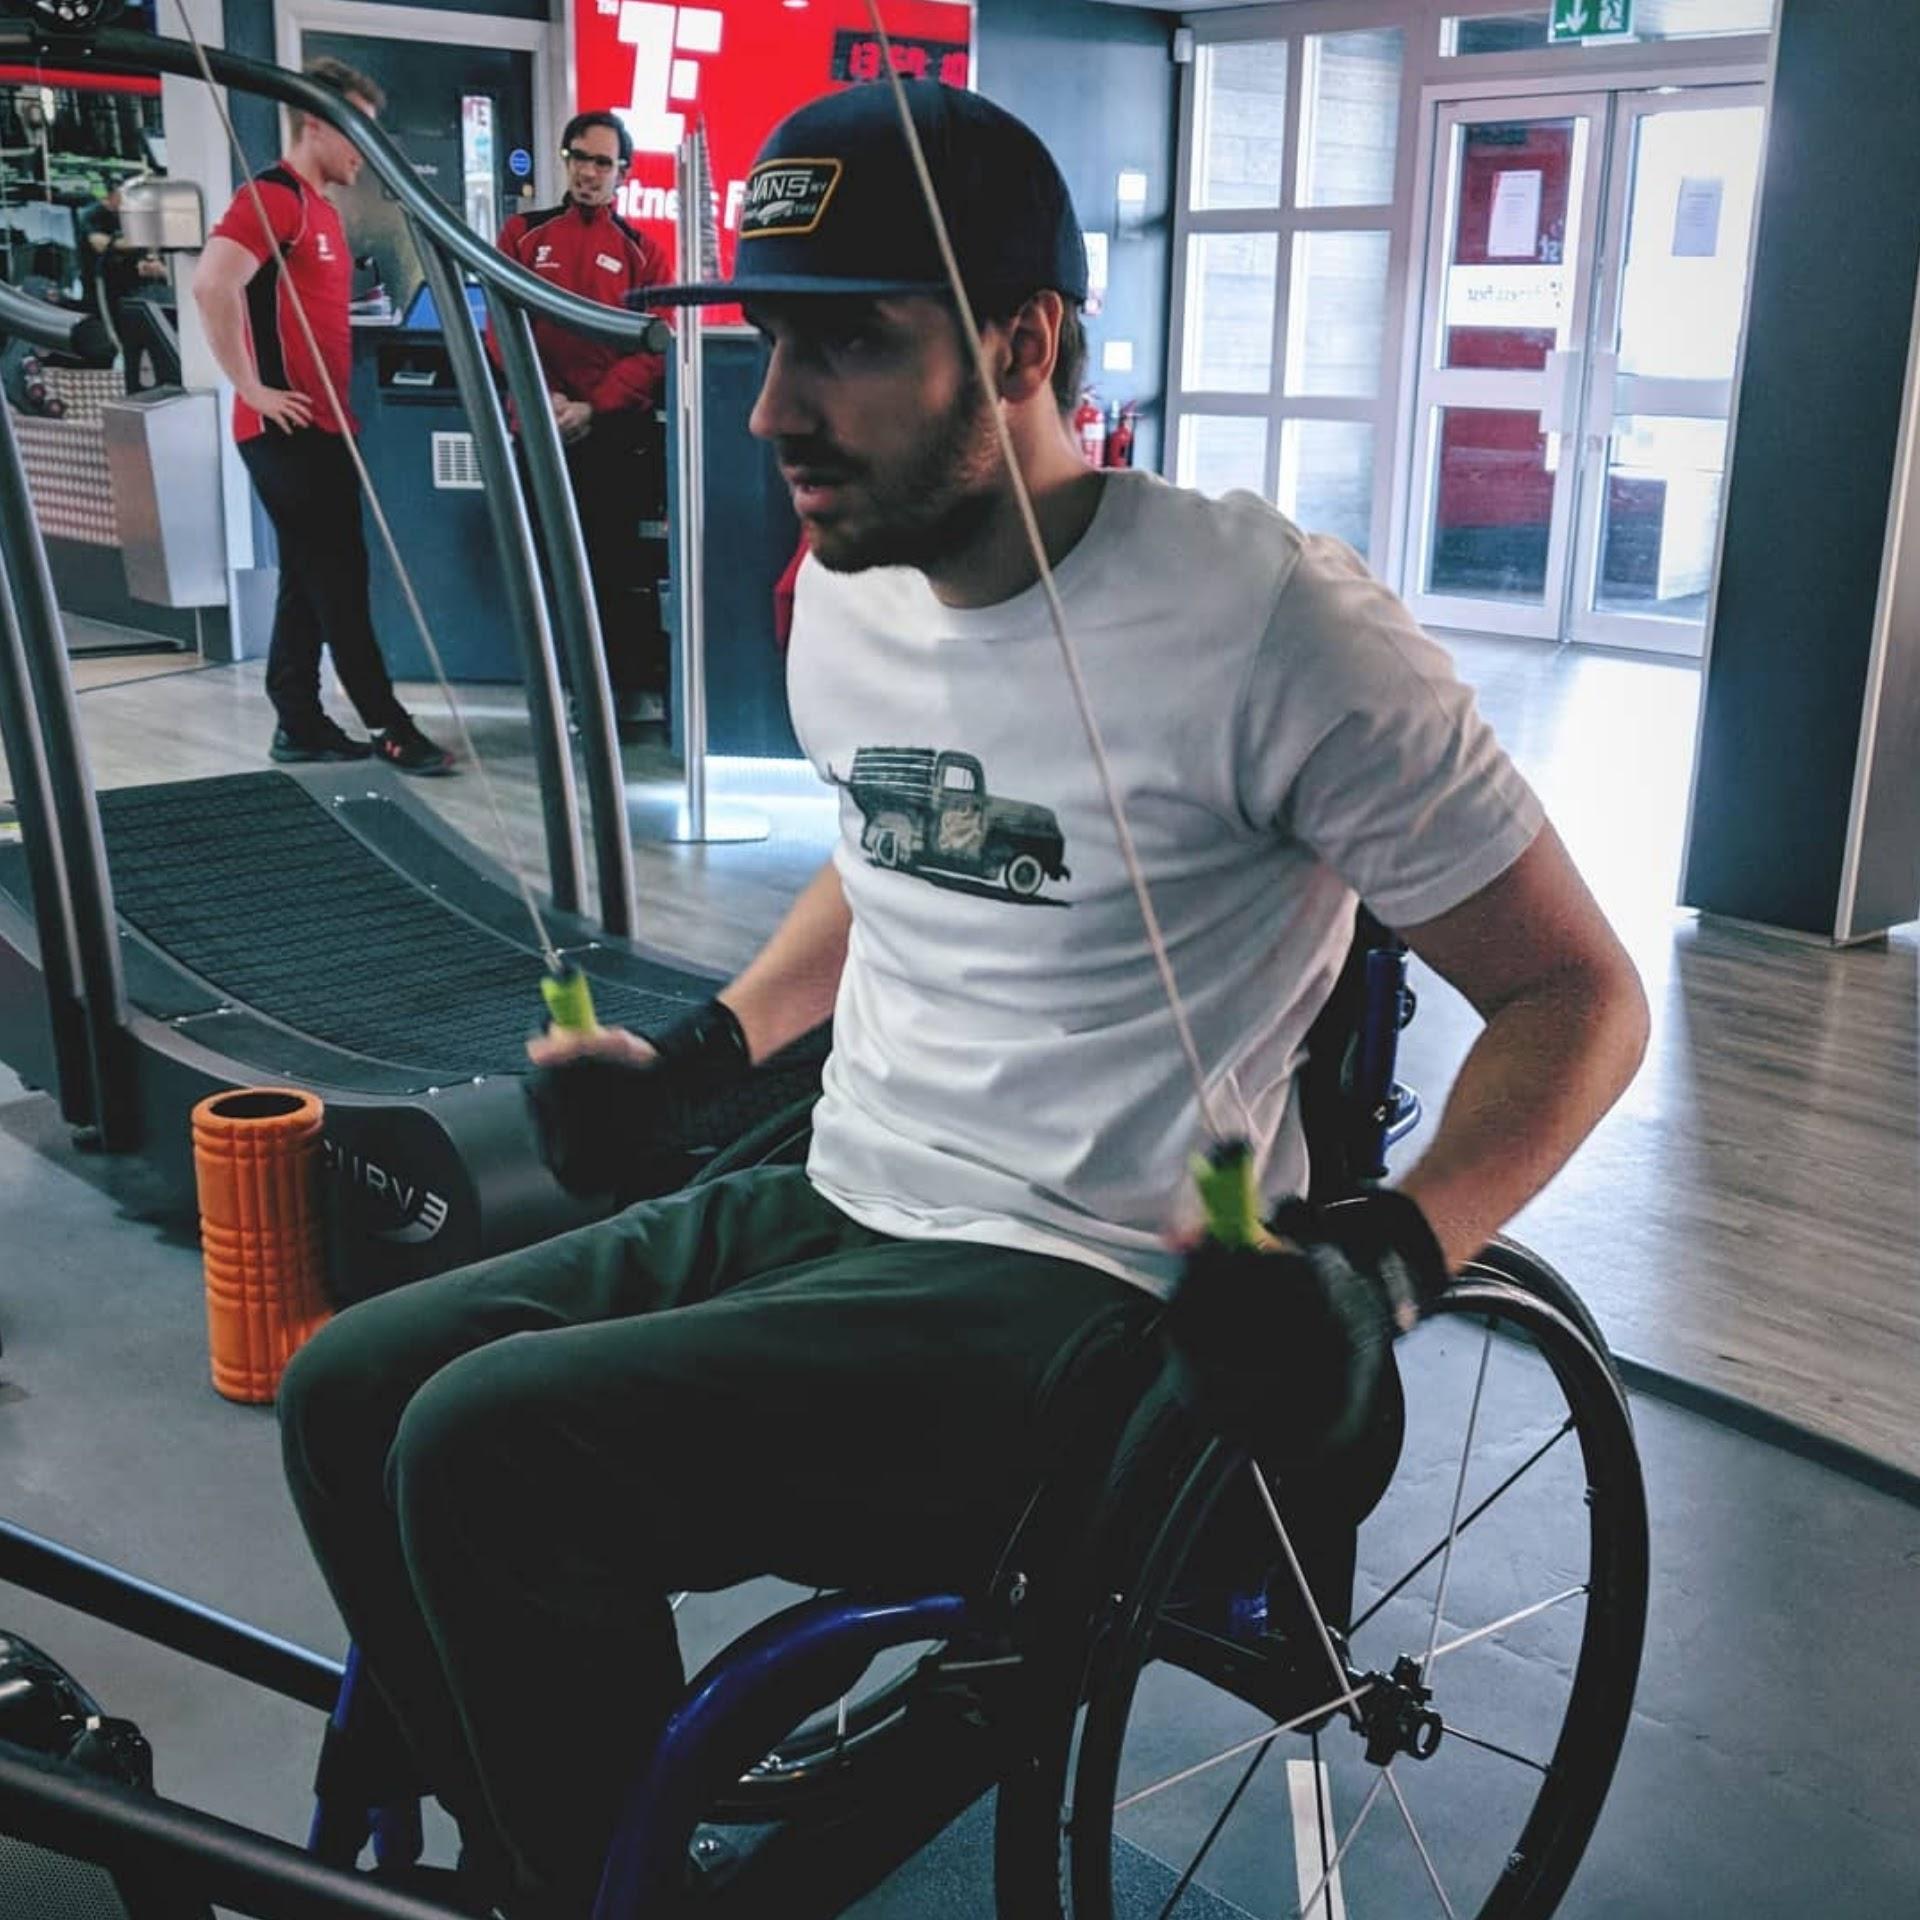 Ben Clark, tetraplegic swimmer, training at the gym for his 10km swim